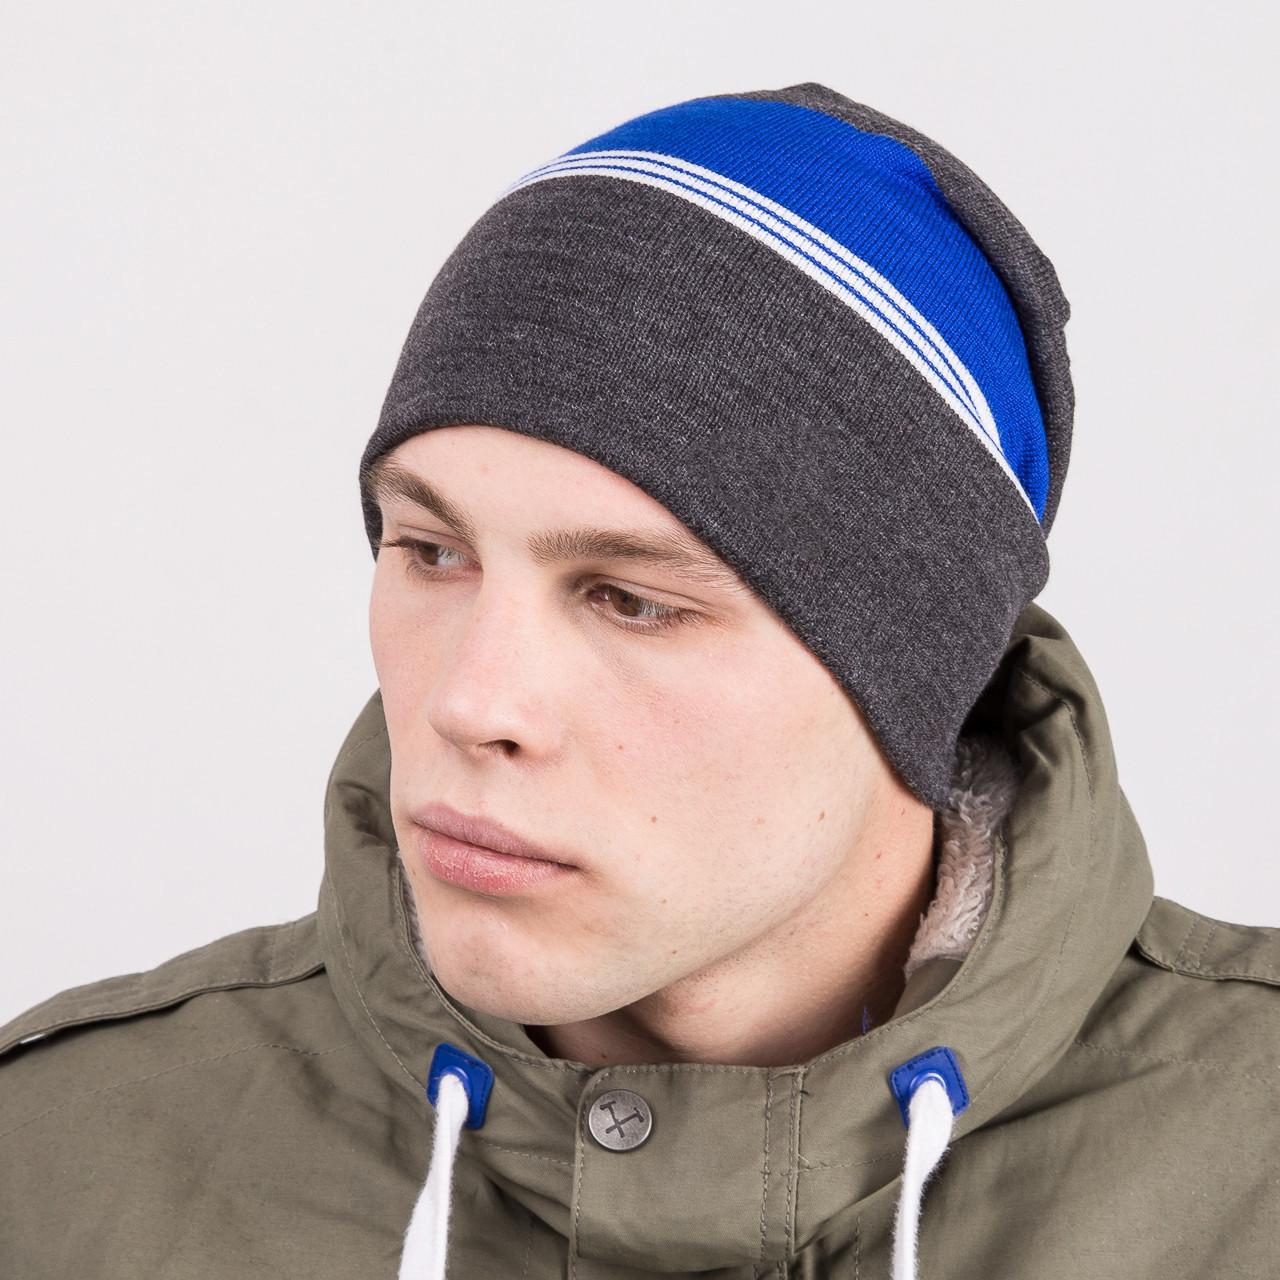 купить вязаную шапку колпак на зиму мужскую артикул M67a по лучшим